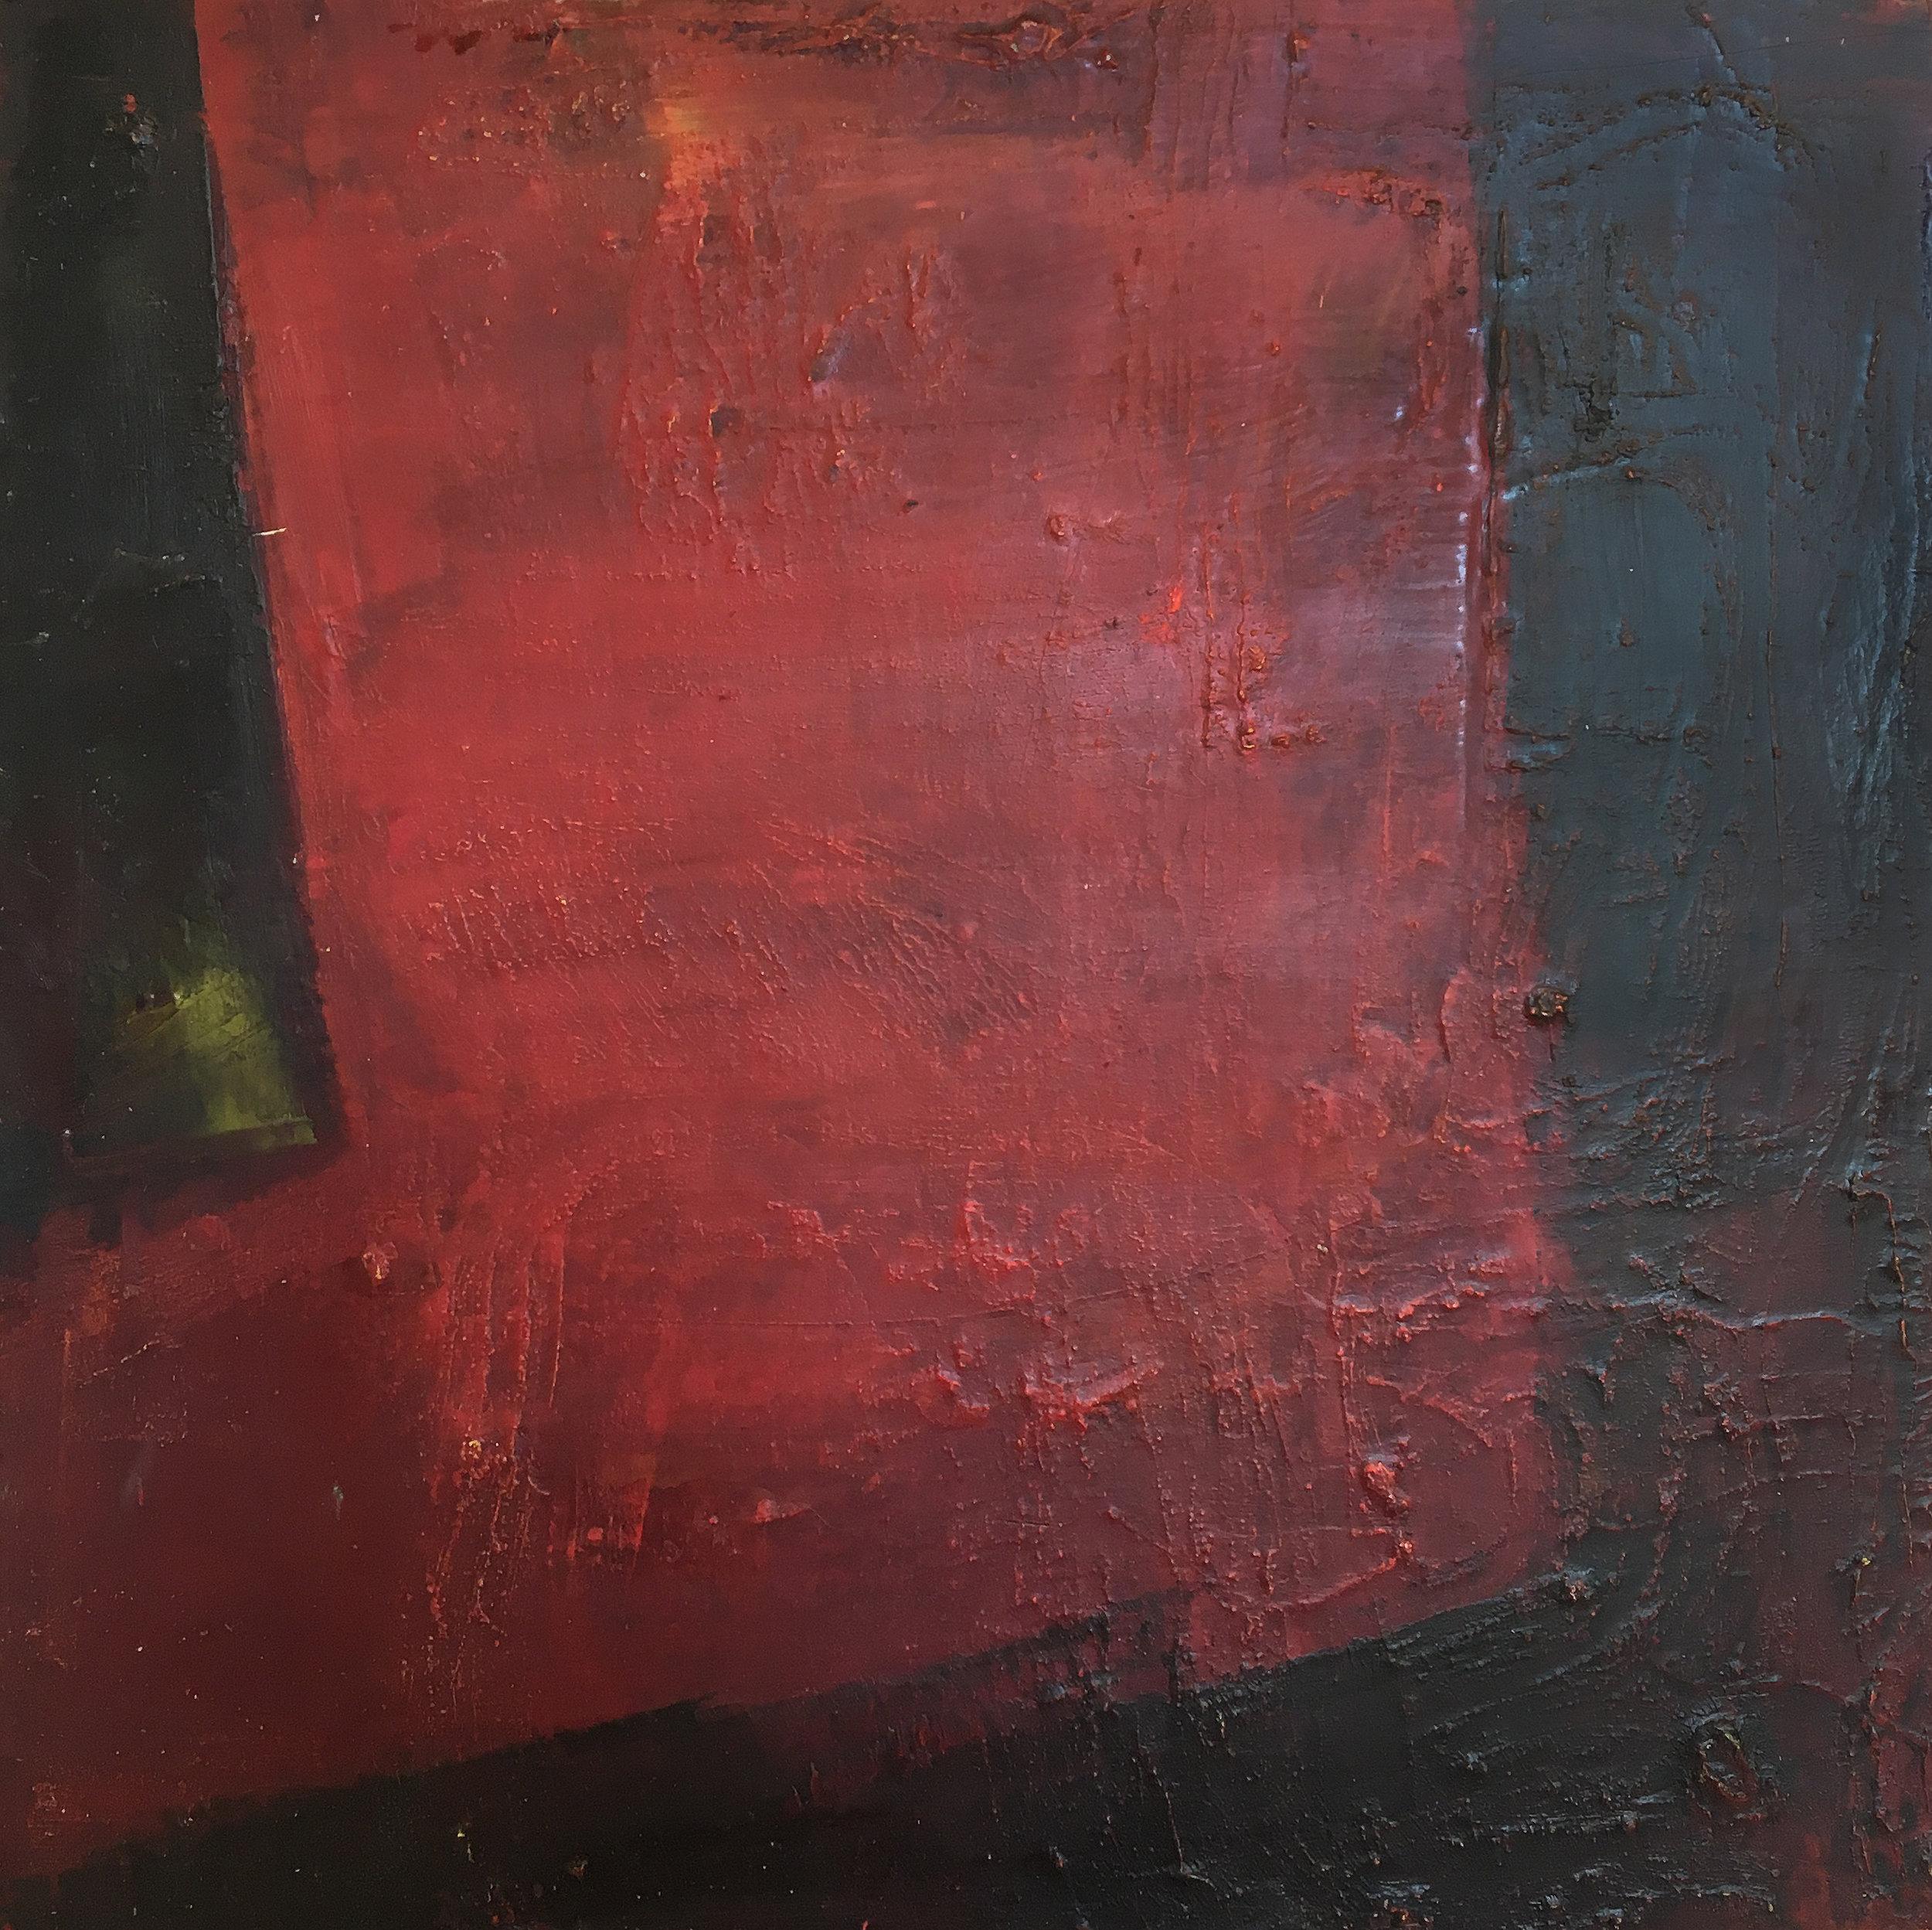 "The Dark  , oil on cradled panel, 12"" x 12"", 2017"